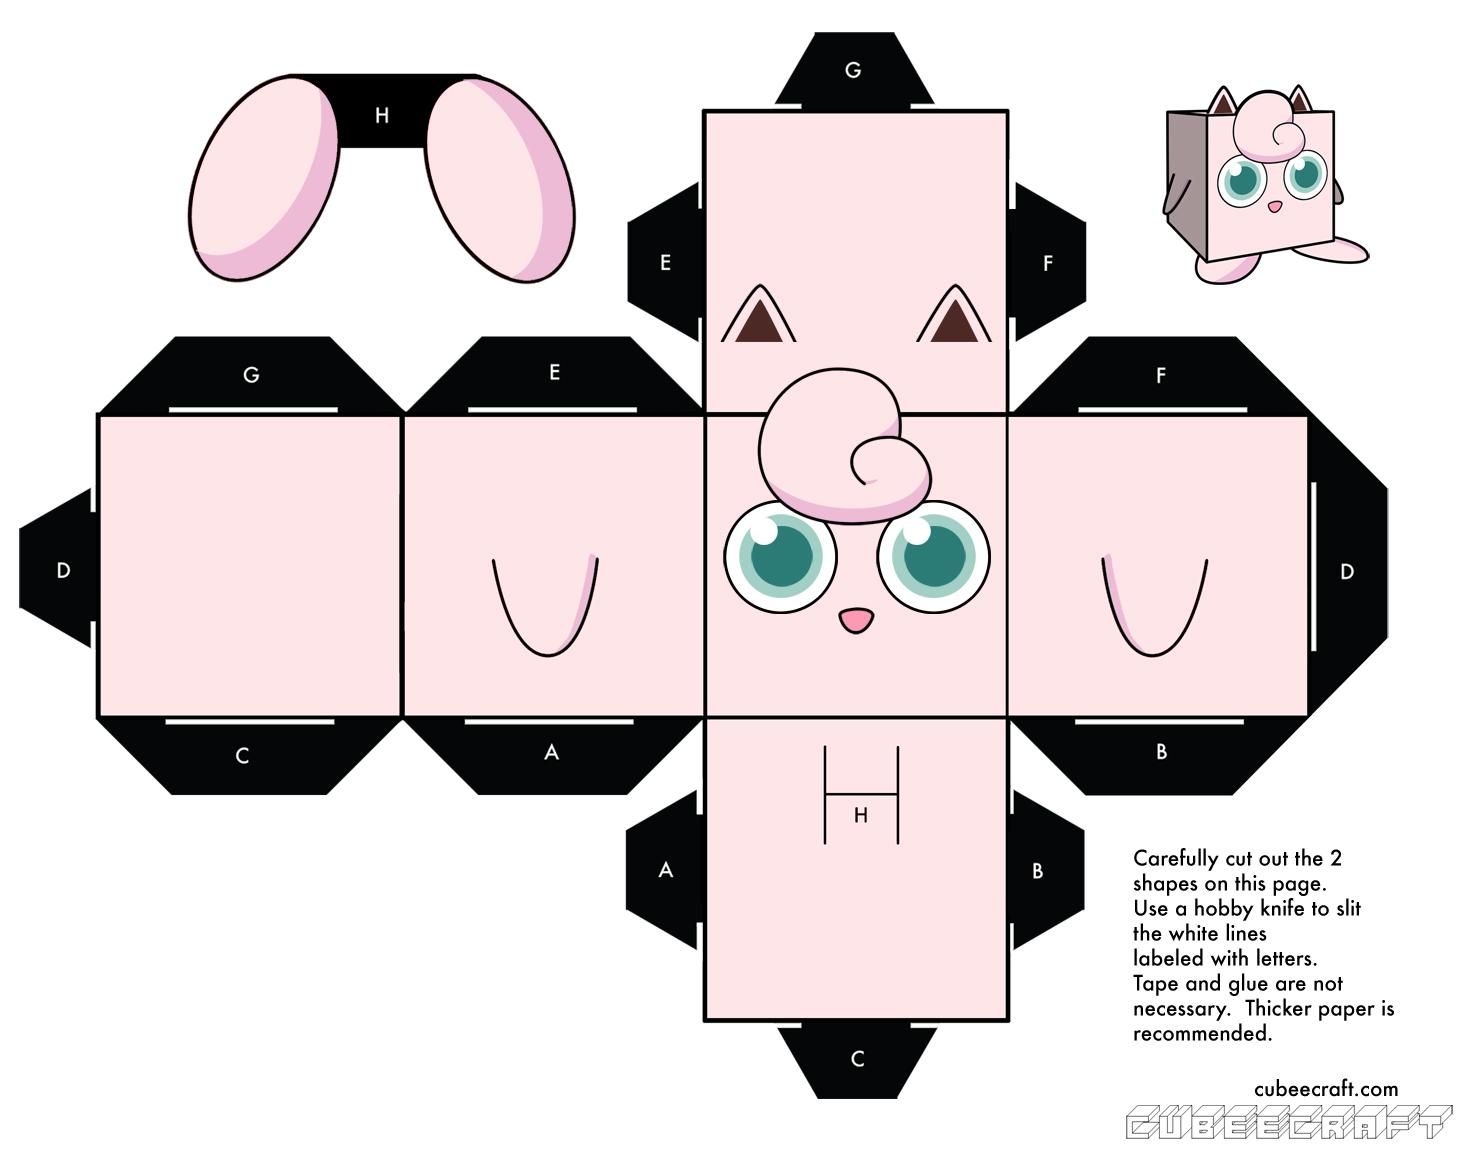 pokemon templates print - cubeecraft cubeecraft de pok mon